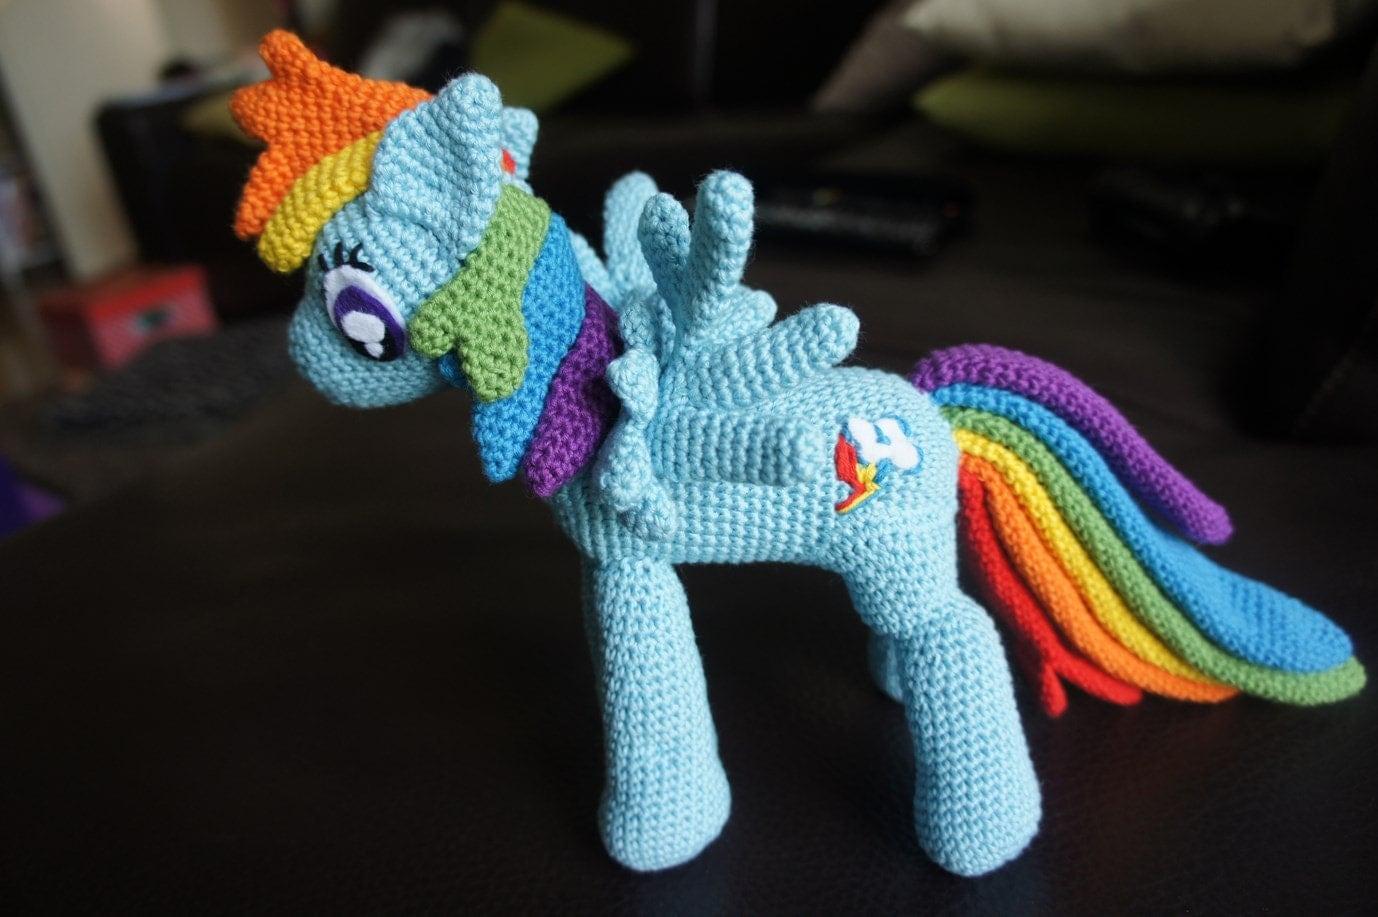 Amigurumi My Little Pony Patron : Crochet My LIttle Pony Rainbow Dash Amigurumi Plush